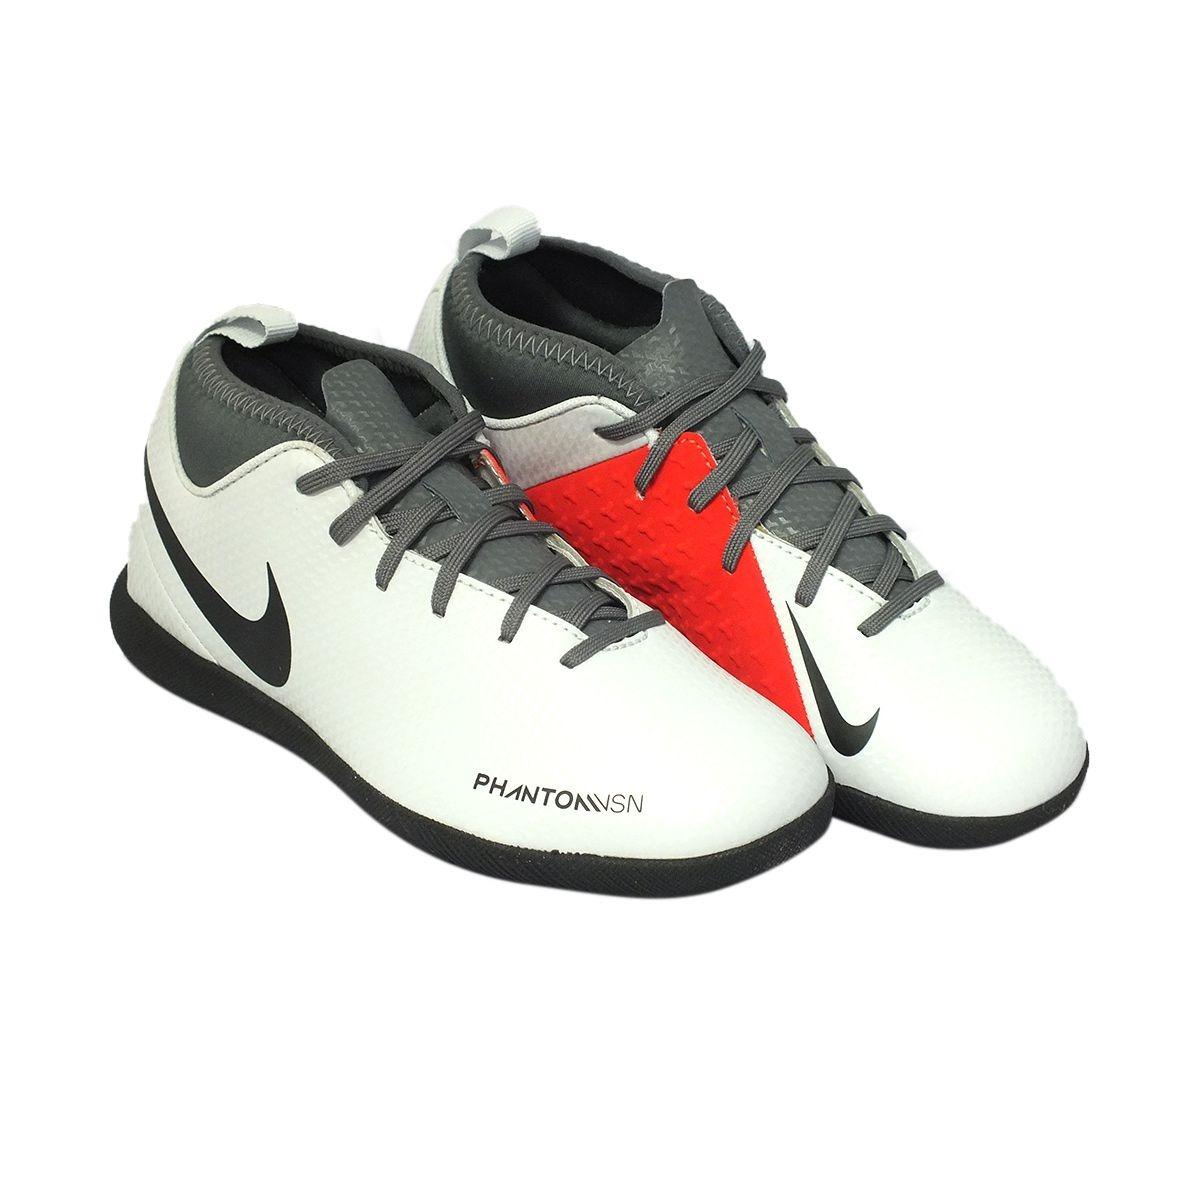 9f4380037f Chuteira Nike Phantom Vision Club Society Infantil - R  249